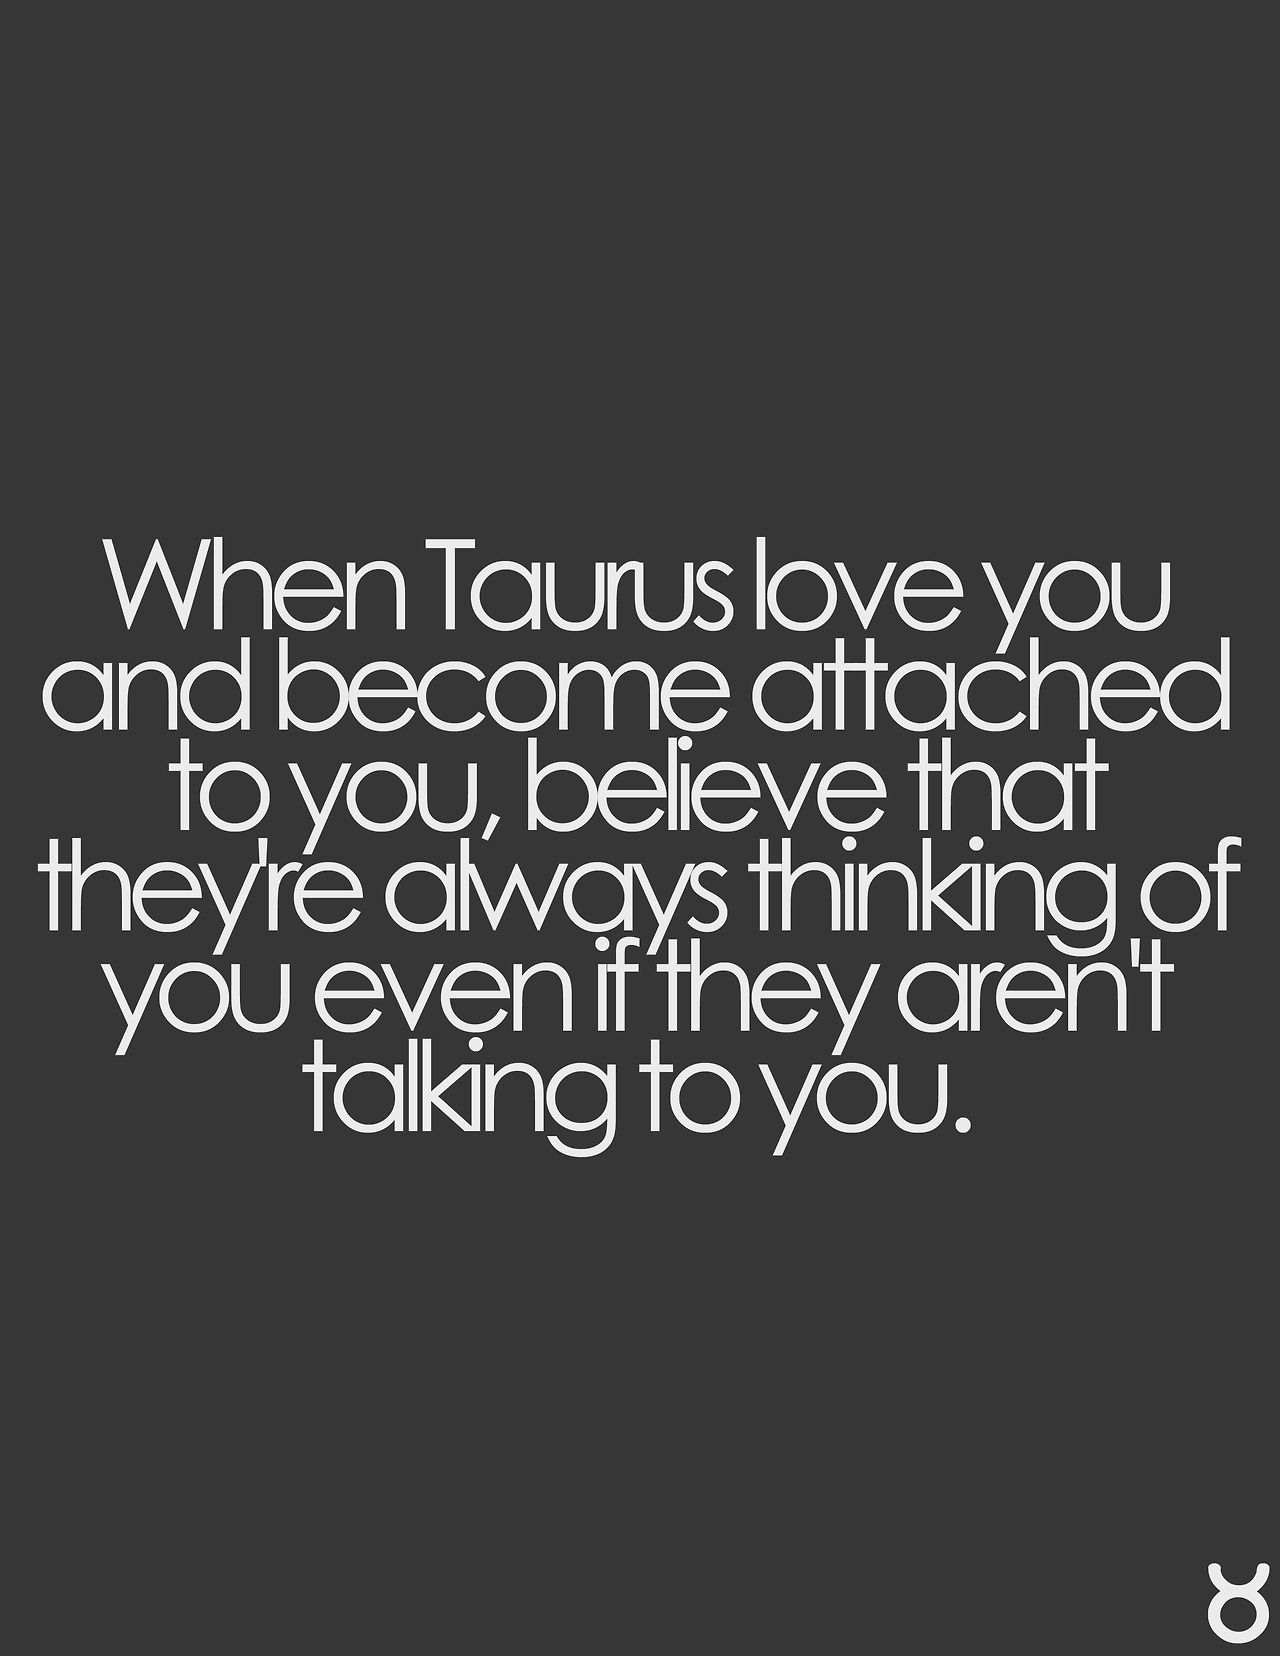 5 cruel truths about Taurus in love